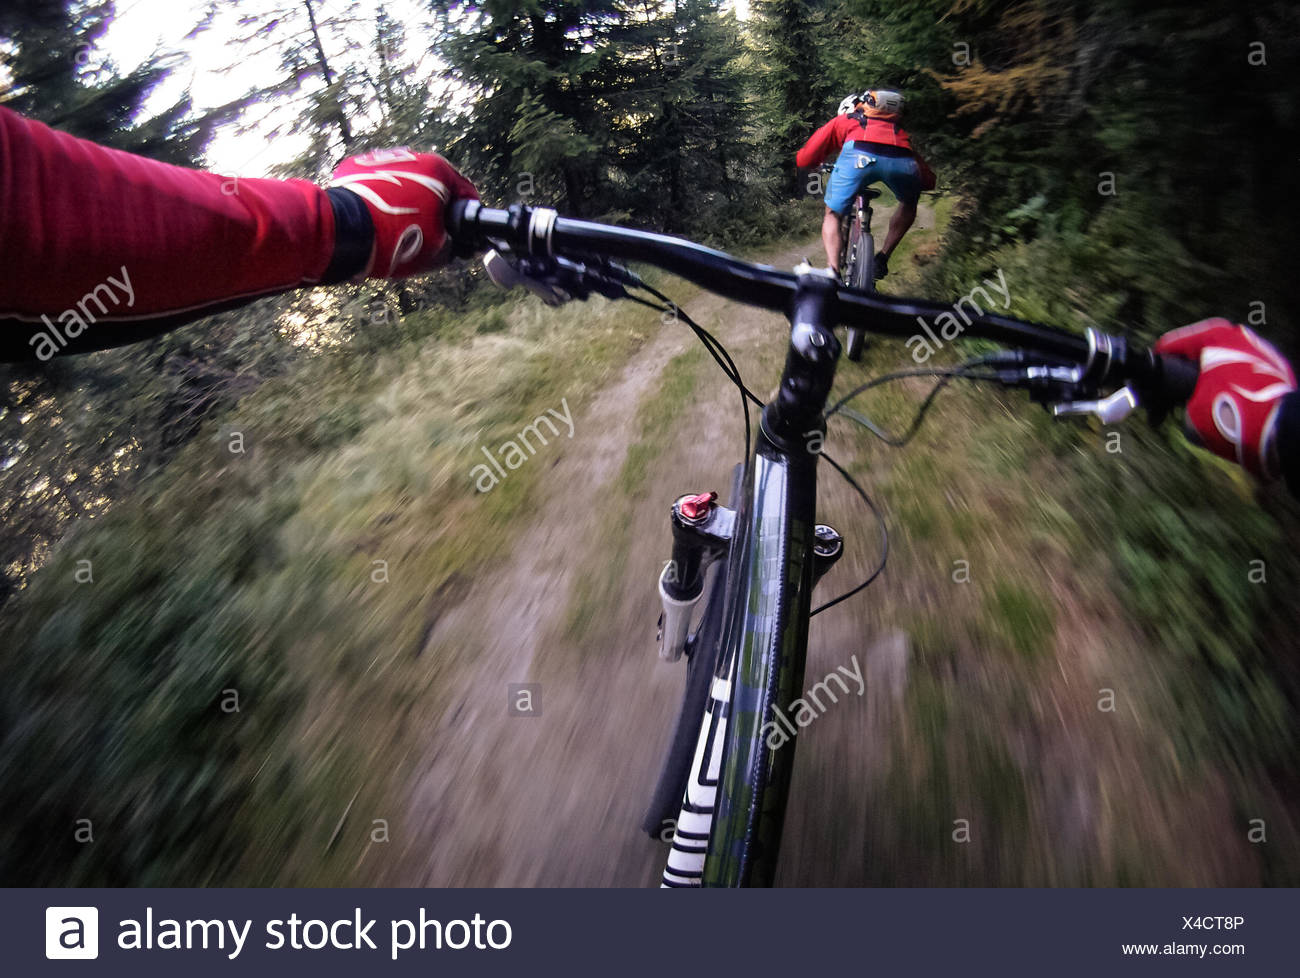 Austria, Salzburg, Shot of mountain biker chasing another - Stock Image